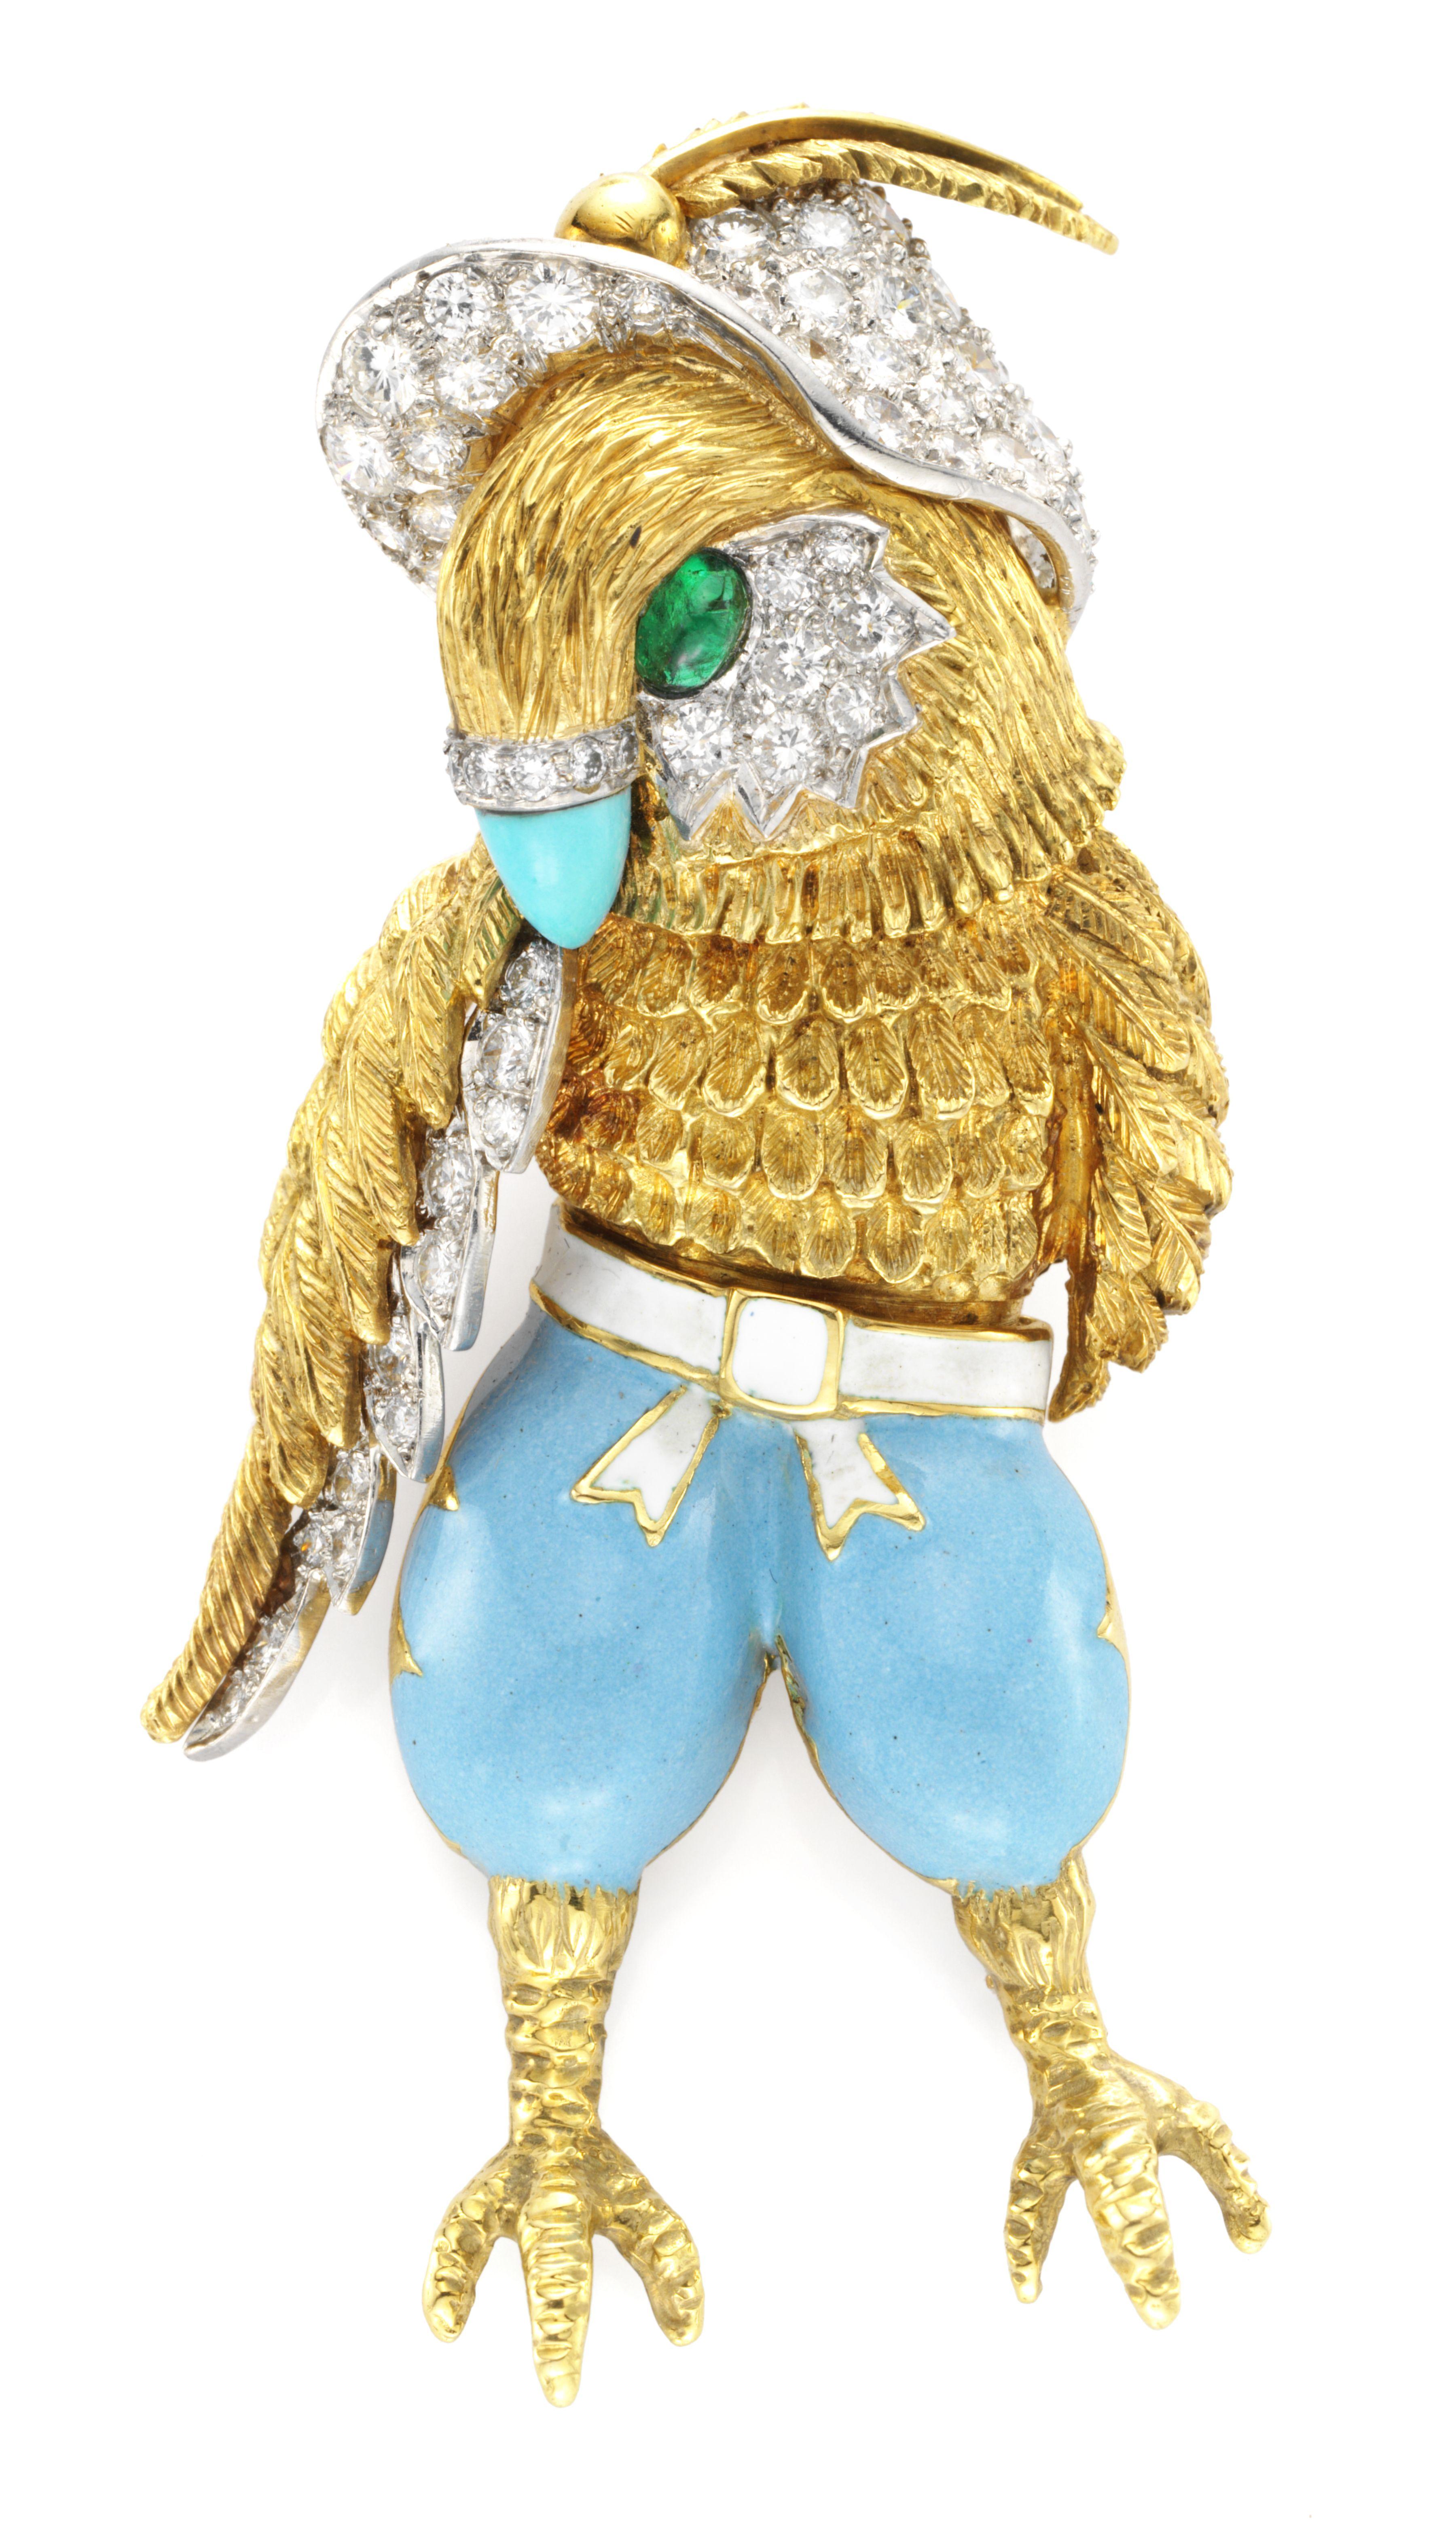 Donald Claflin For Tiffany Amp Co A Gold Enamel Emerald